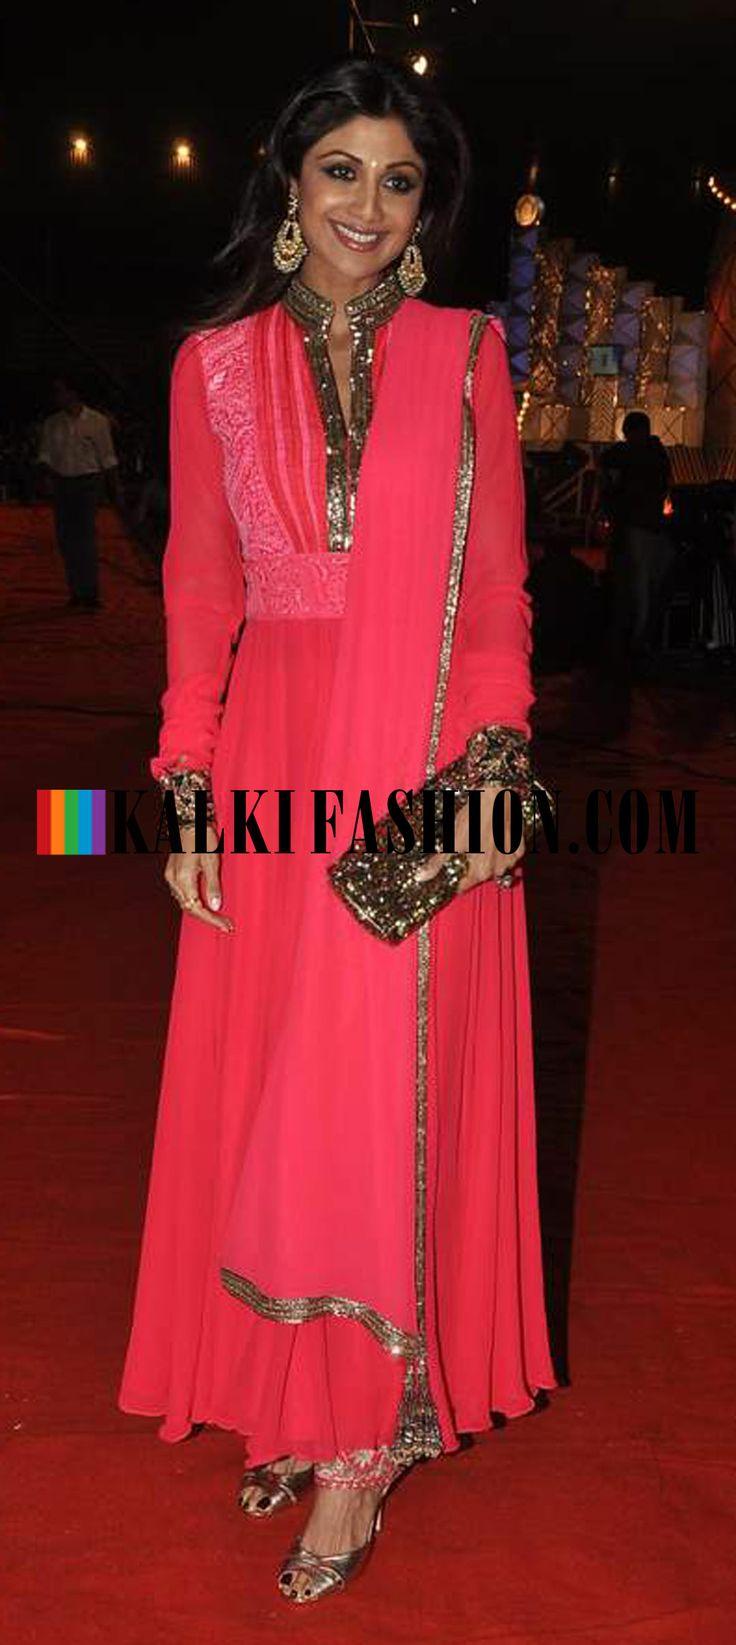 http://www.kalkifashion.com/ Shipla Shetty in pink Manish Malhotra's anarkali attends 2014 Umang Police Show